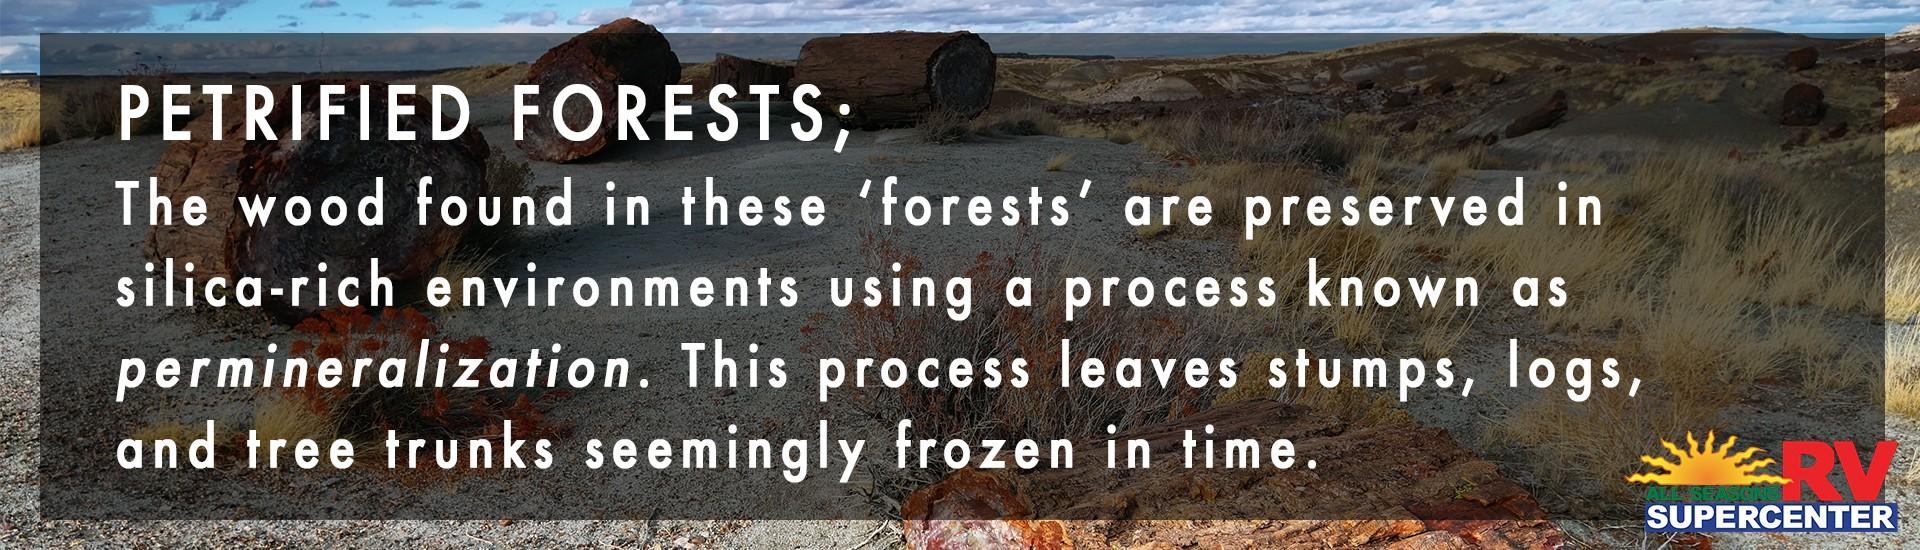 define pretrified forests